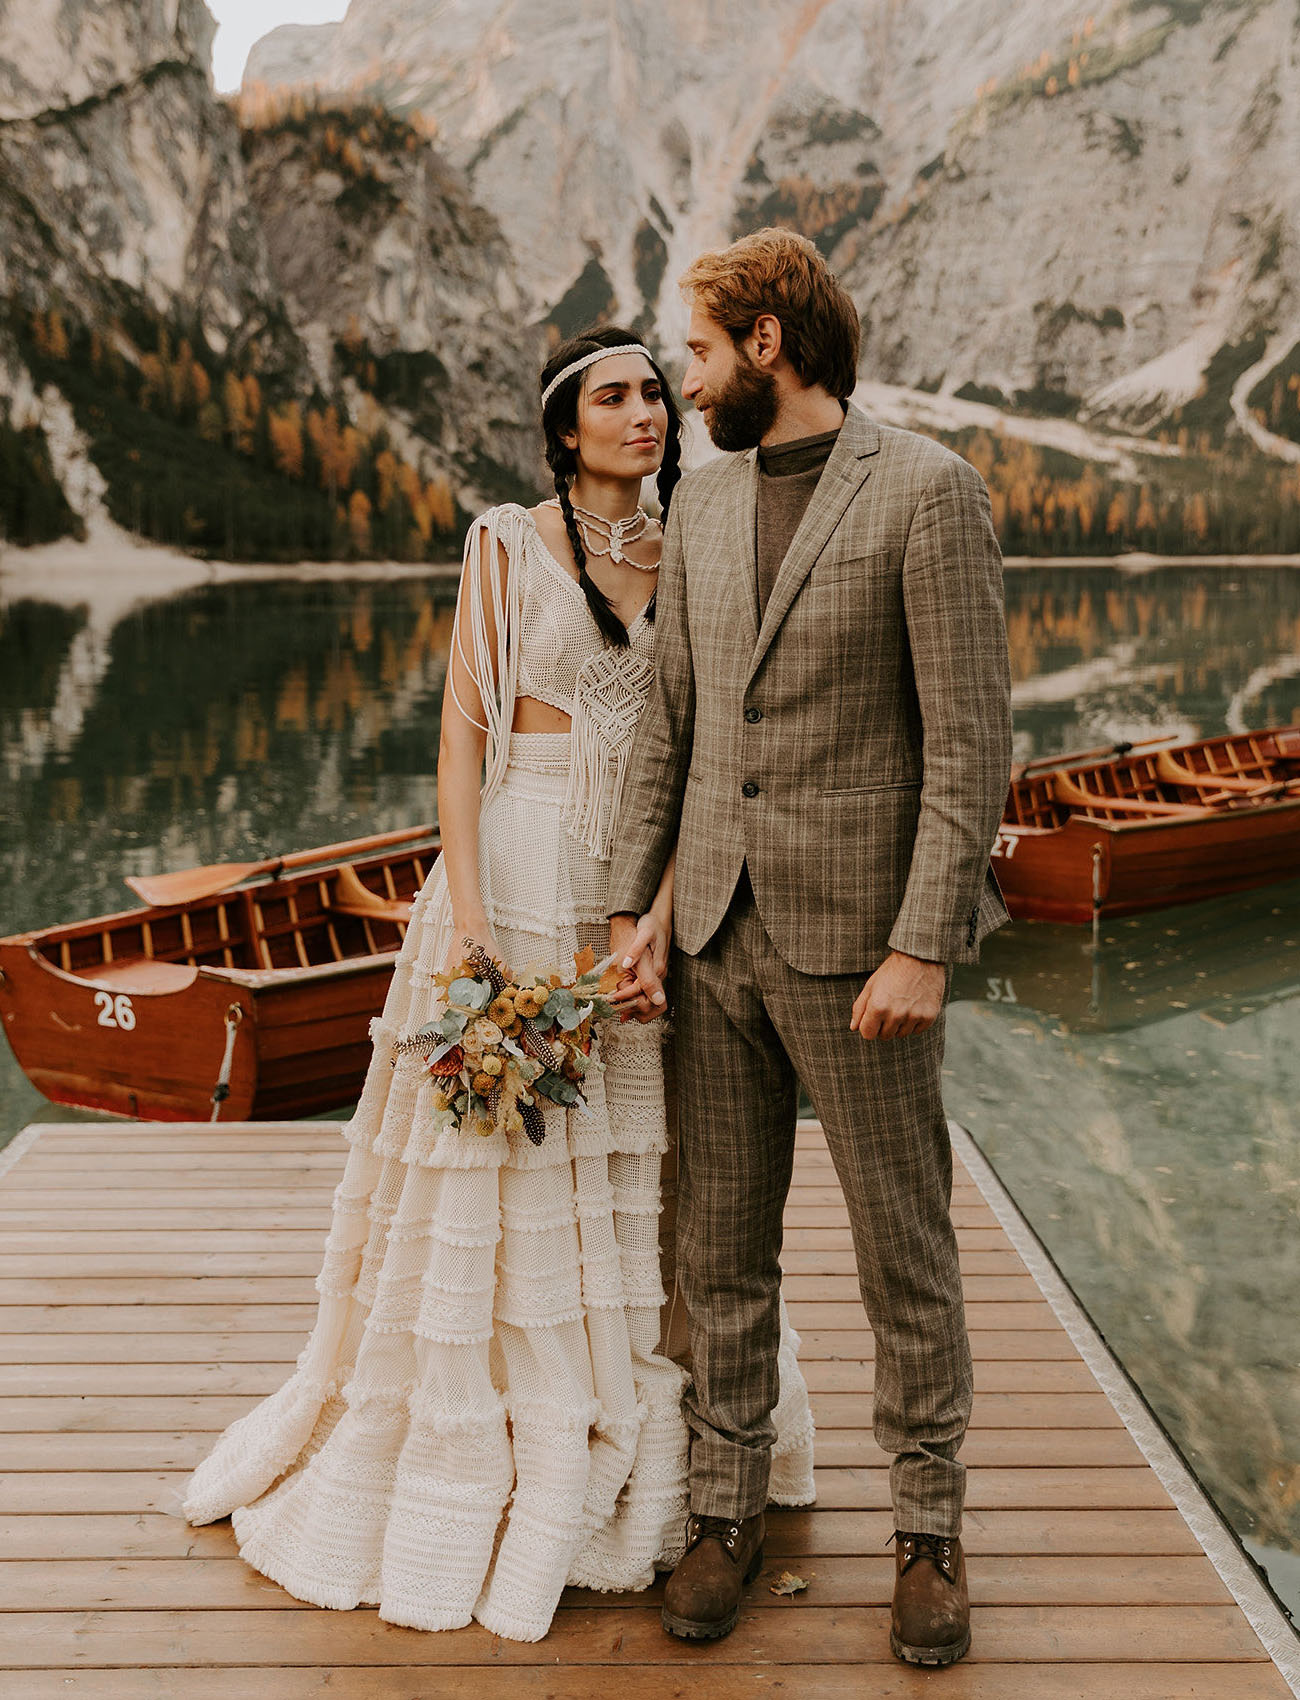 Italian Dolomites Wedding Guide